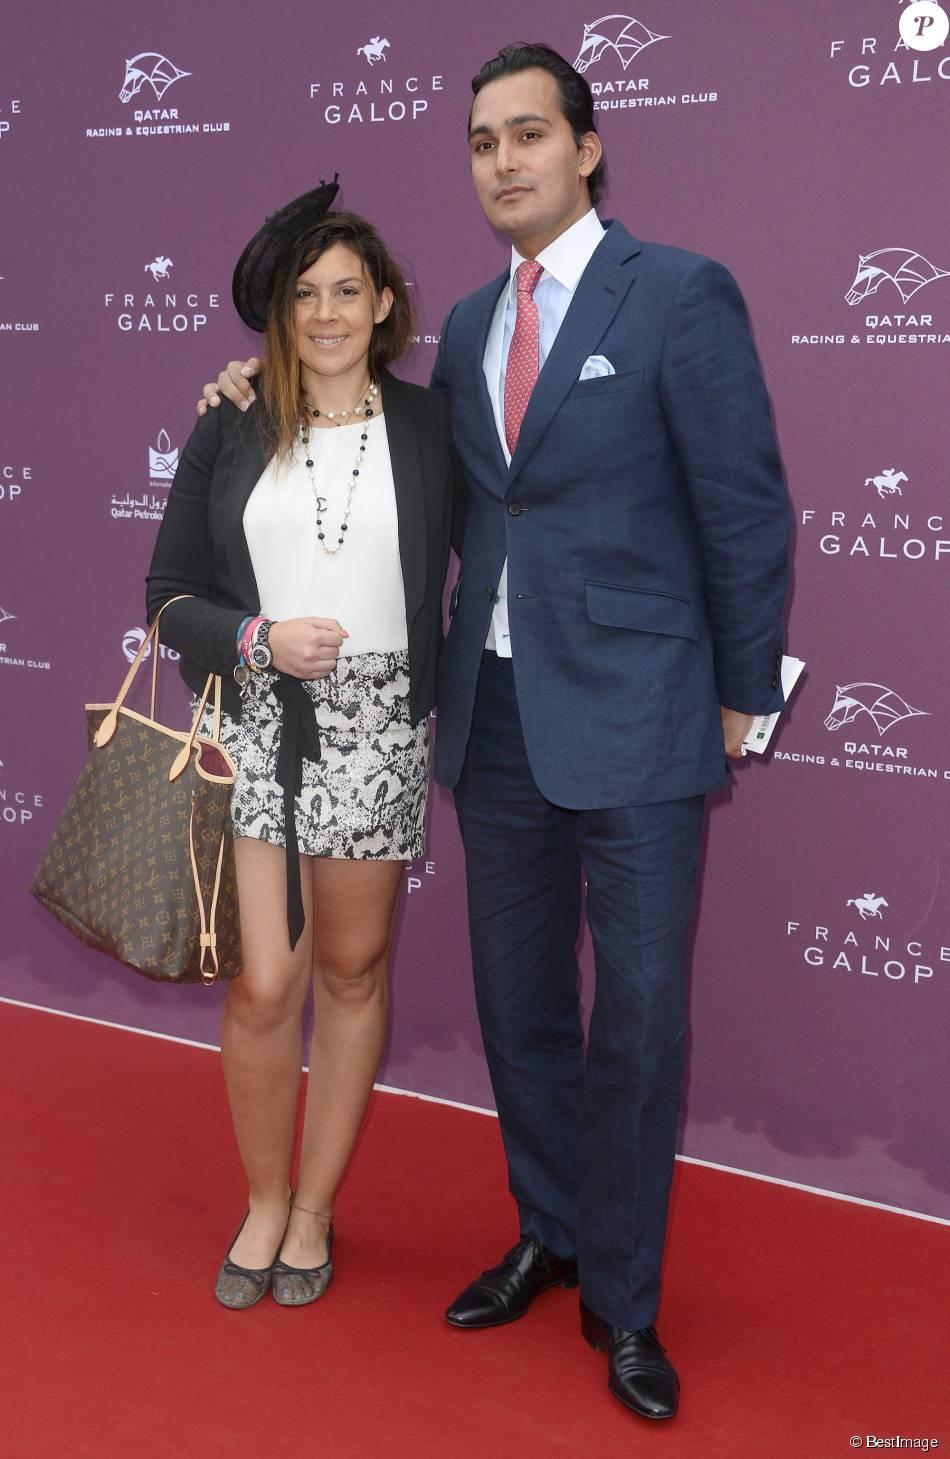 Marion bartoli et son compagnon qatar prix de l 39 arc de for Prix compagnon